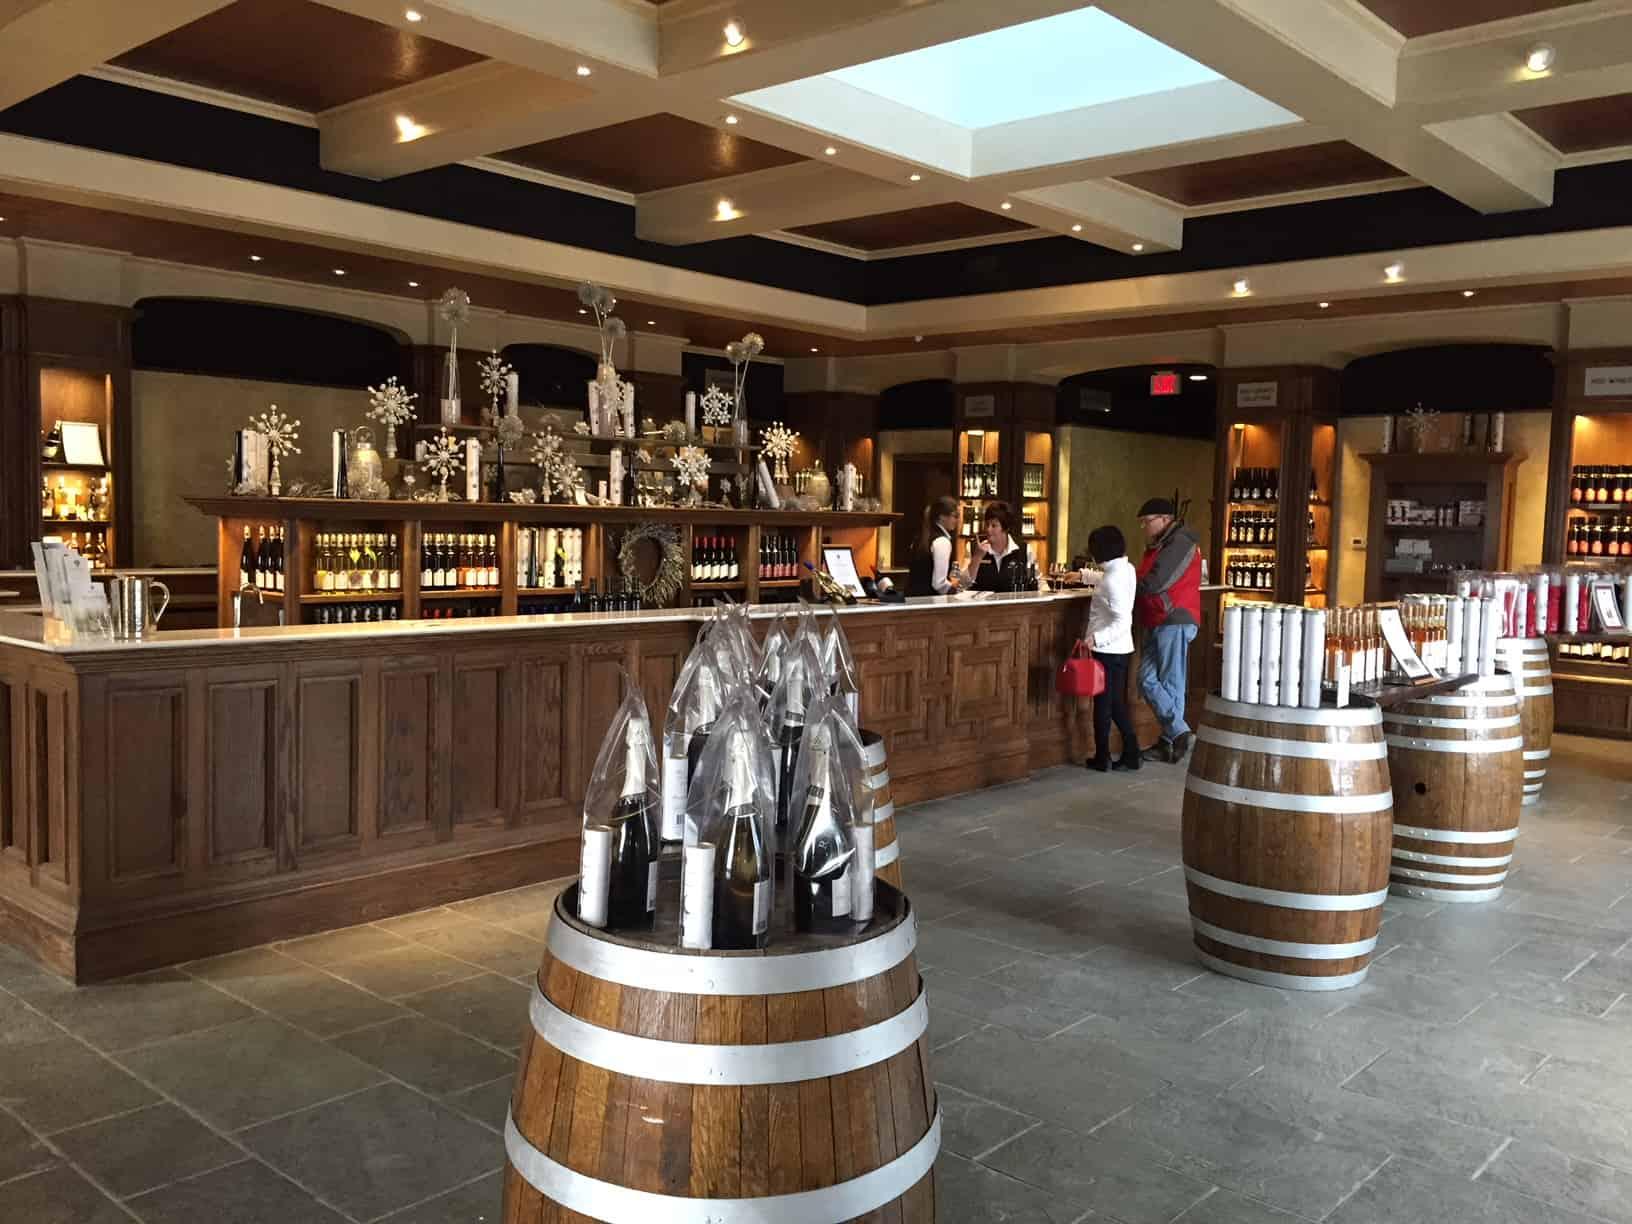 Inside view of Reif Estate Winery tasting room